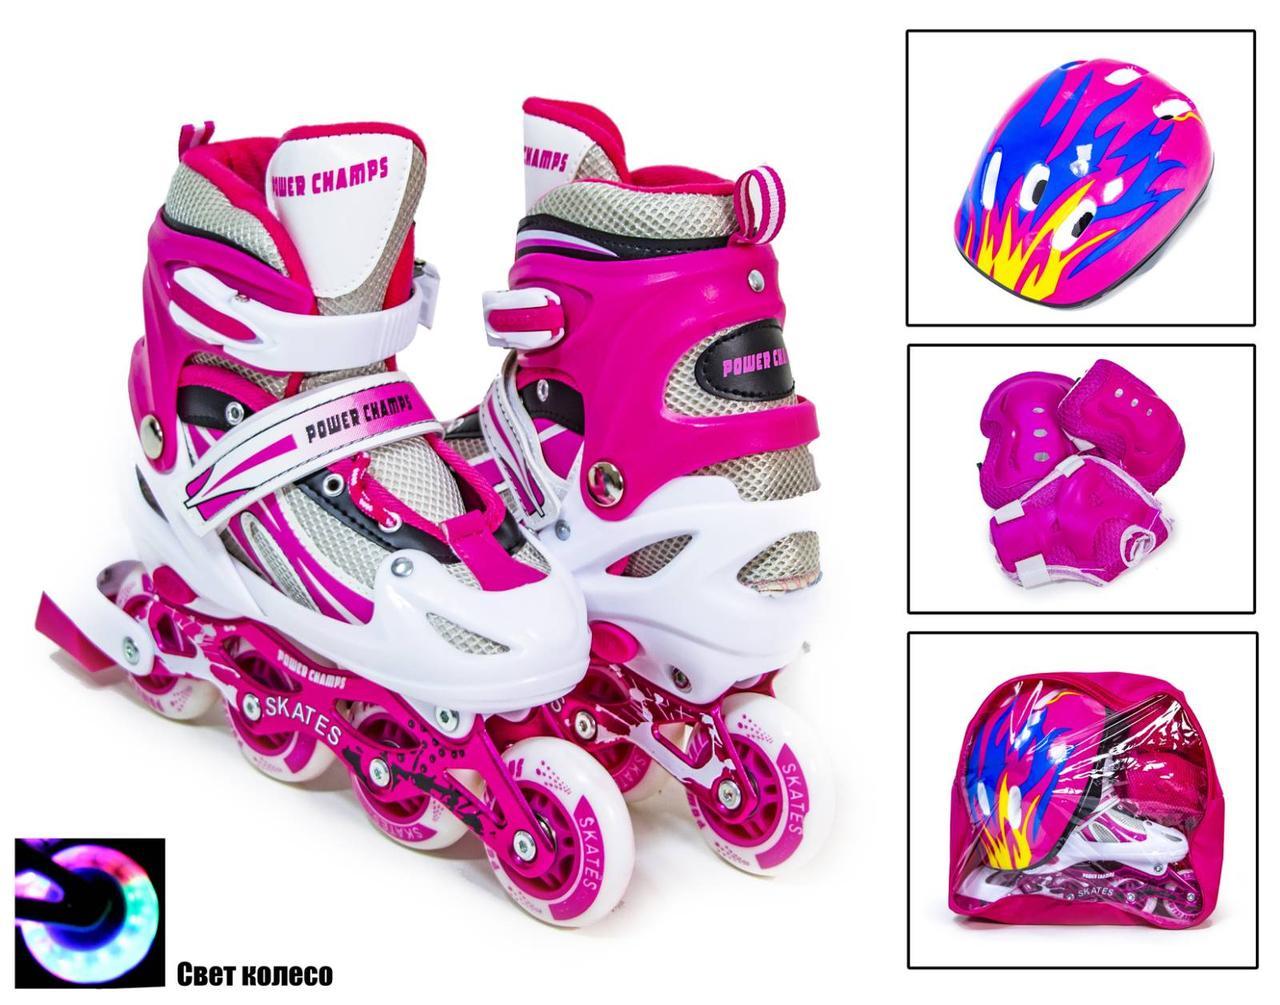 Комплект Power Champs Pink р 34-37